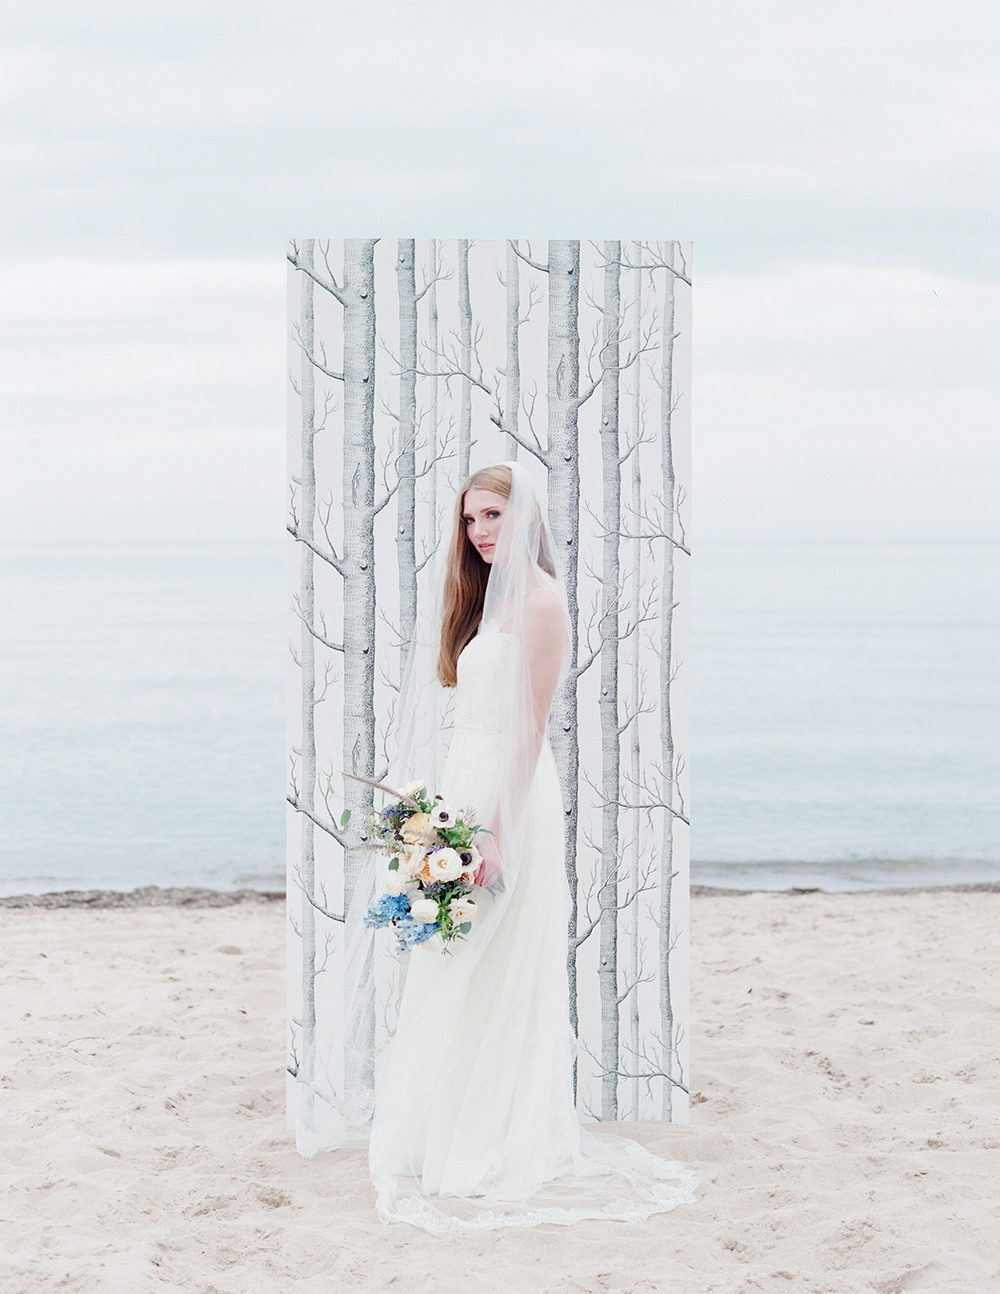 beach wedding flowers in peach and blue.jpg